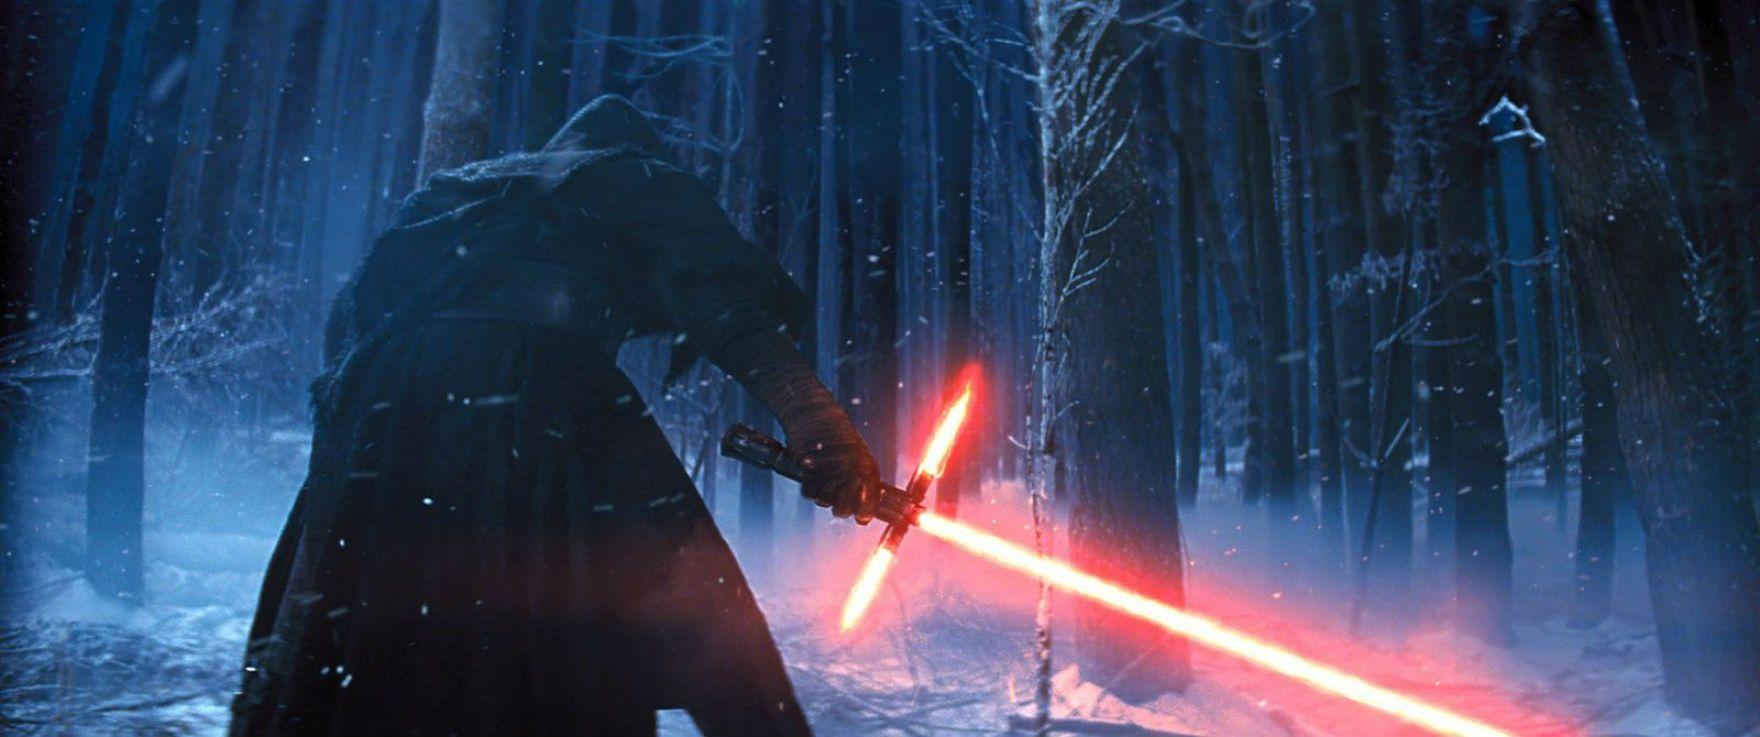 10 Reasons The Next Star Wars Movie Will Break Box Office Records